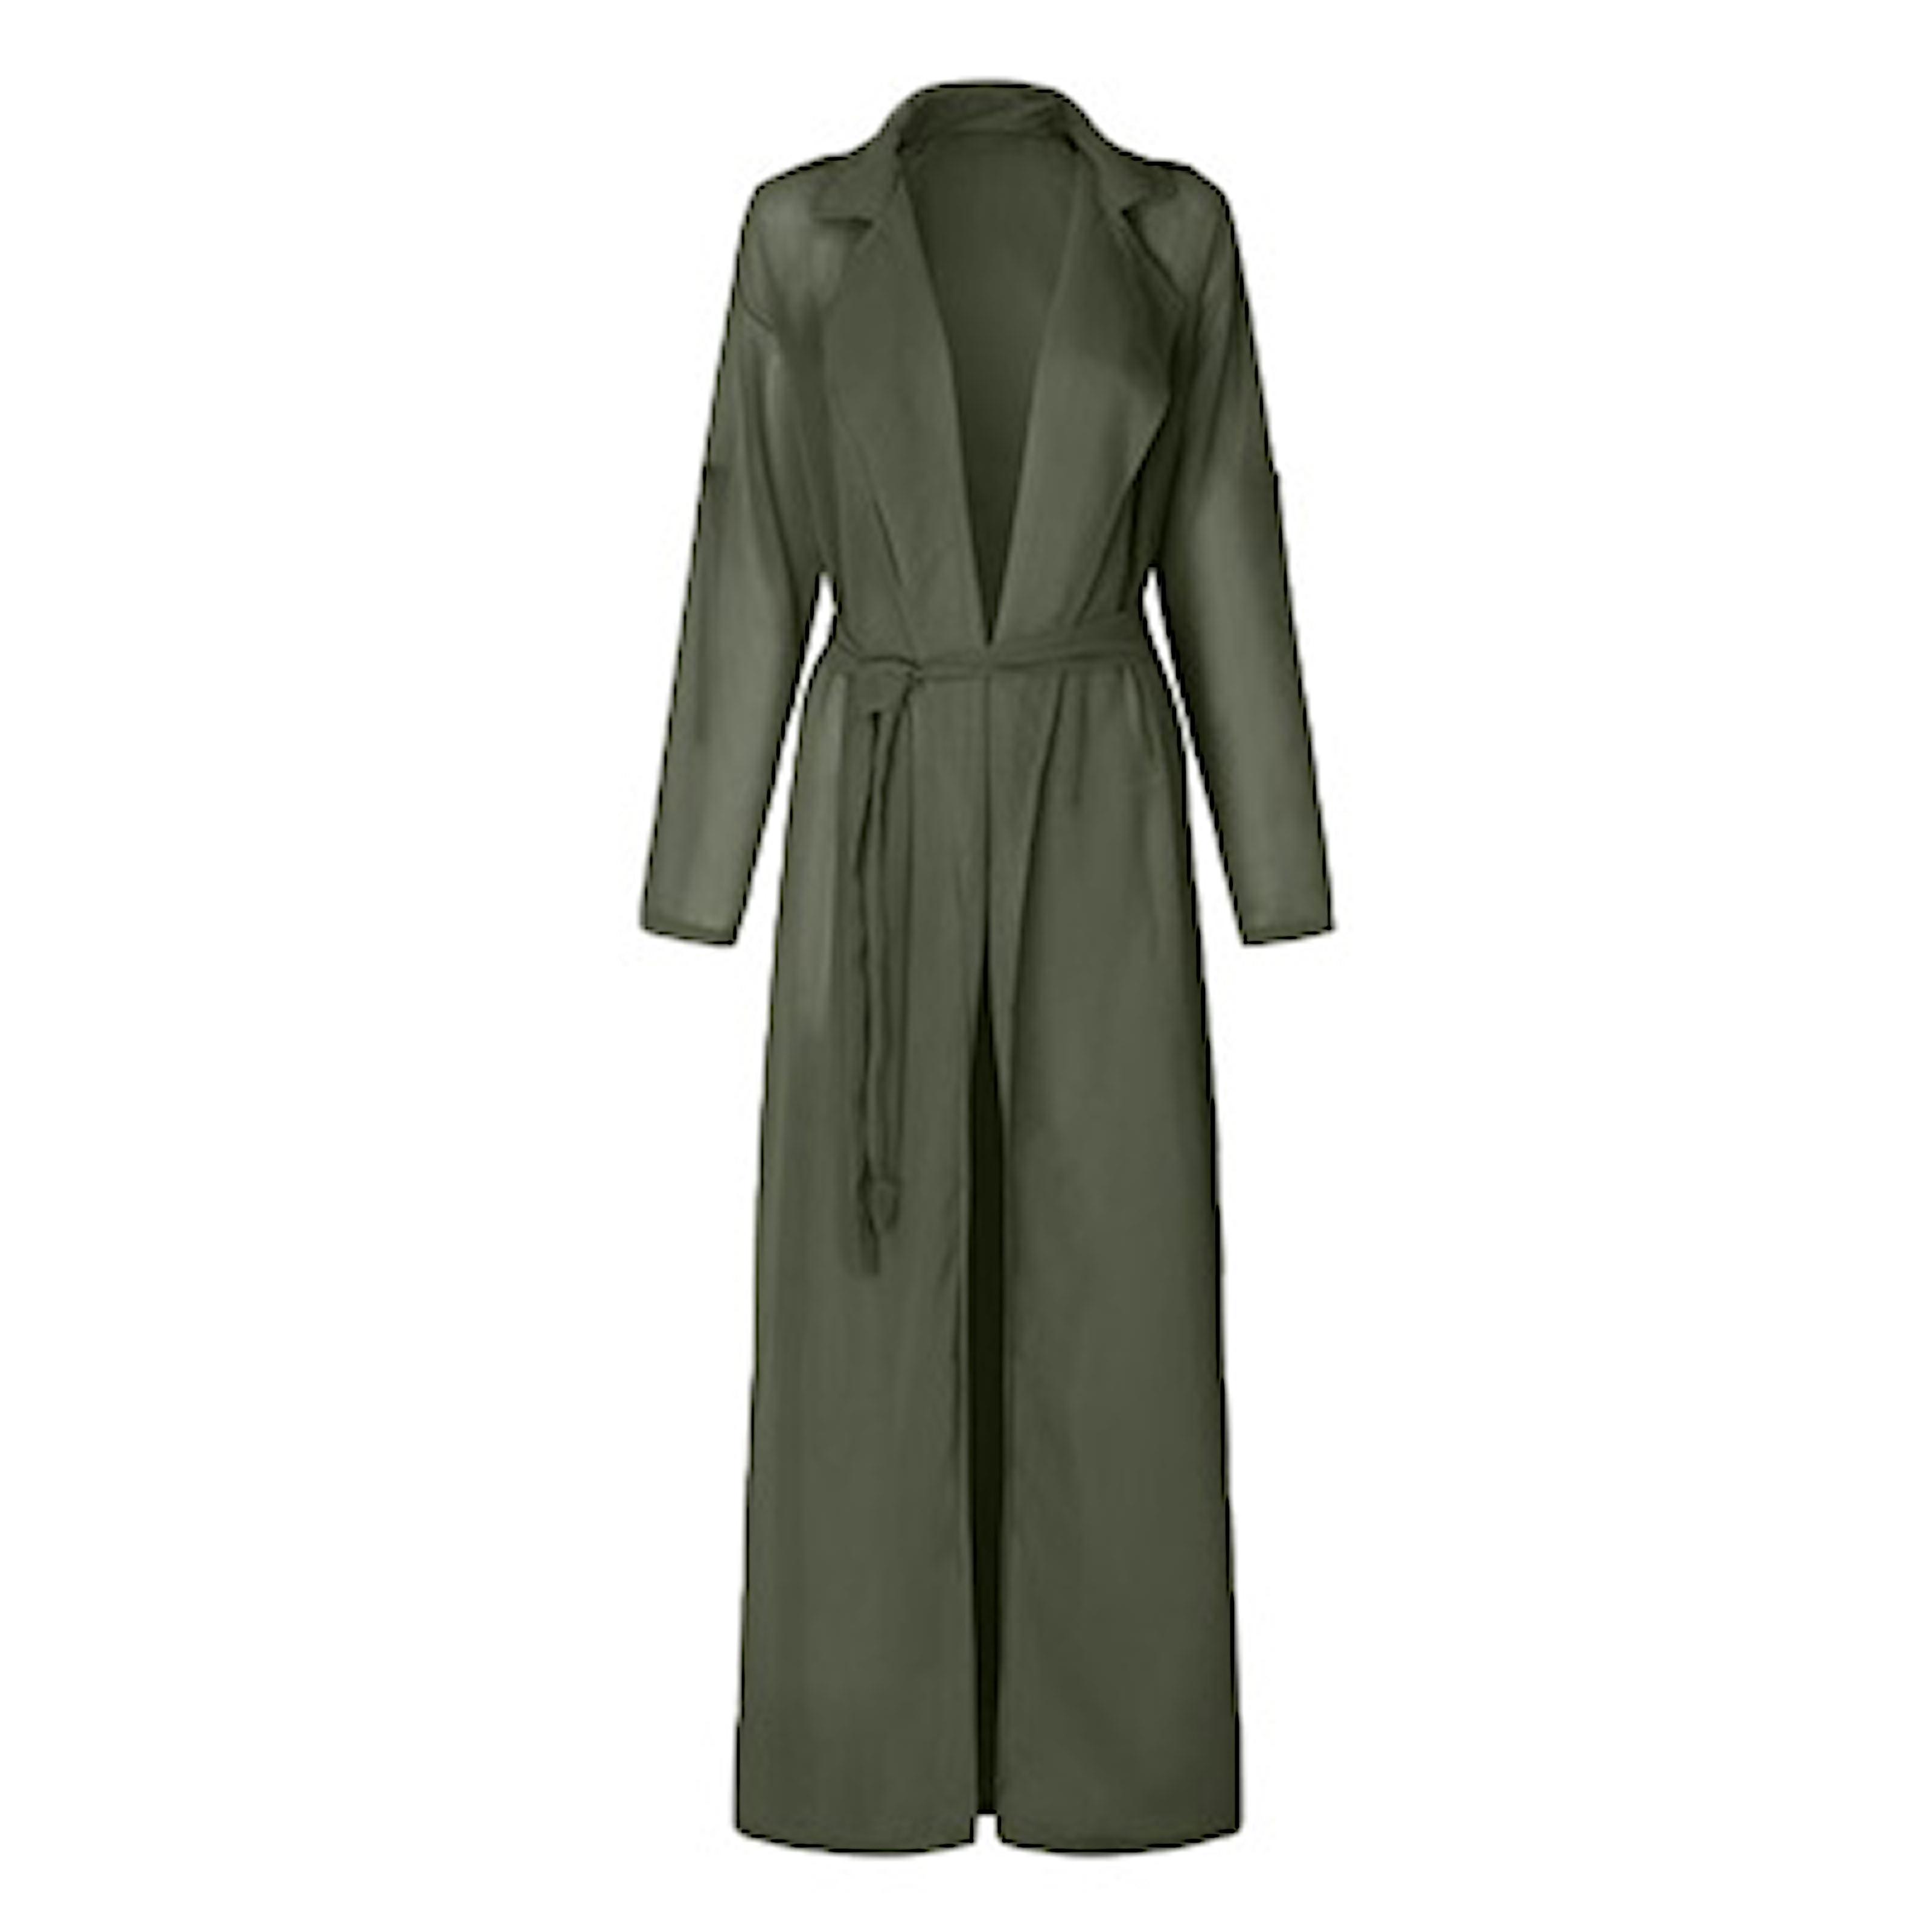 Grønn, S, Chiffon Coat, Elegant chiffon kåpe, ,